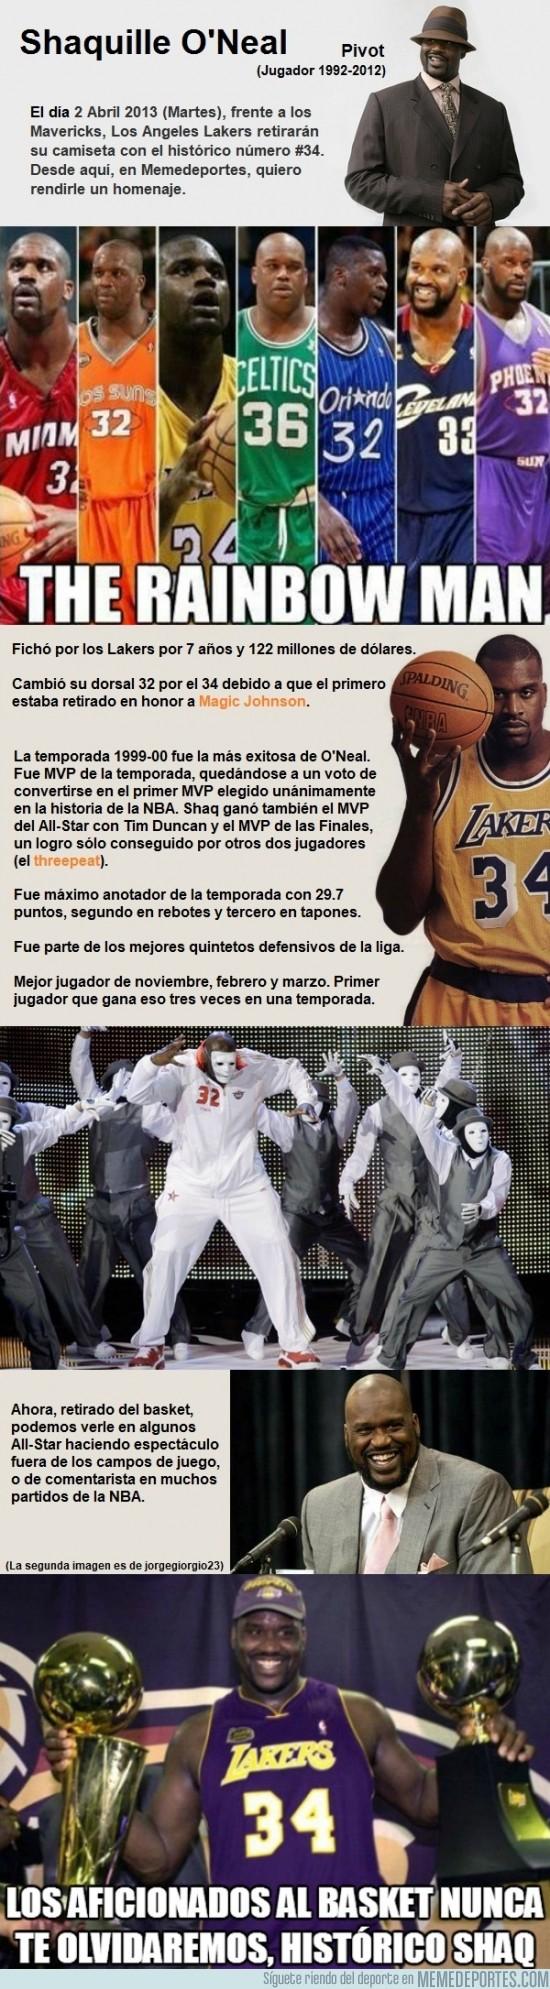 108321 - Los Lakers le retiran el número #34 a Shaq O'Neal, aquí un pequeño homenaje